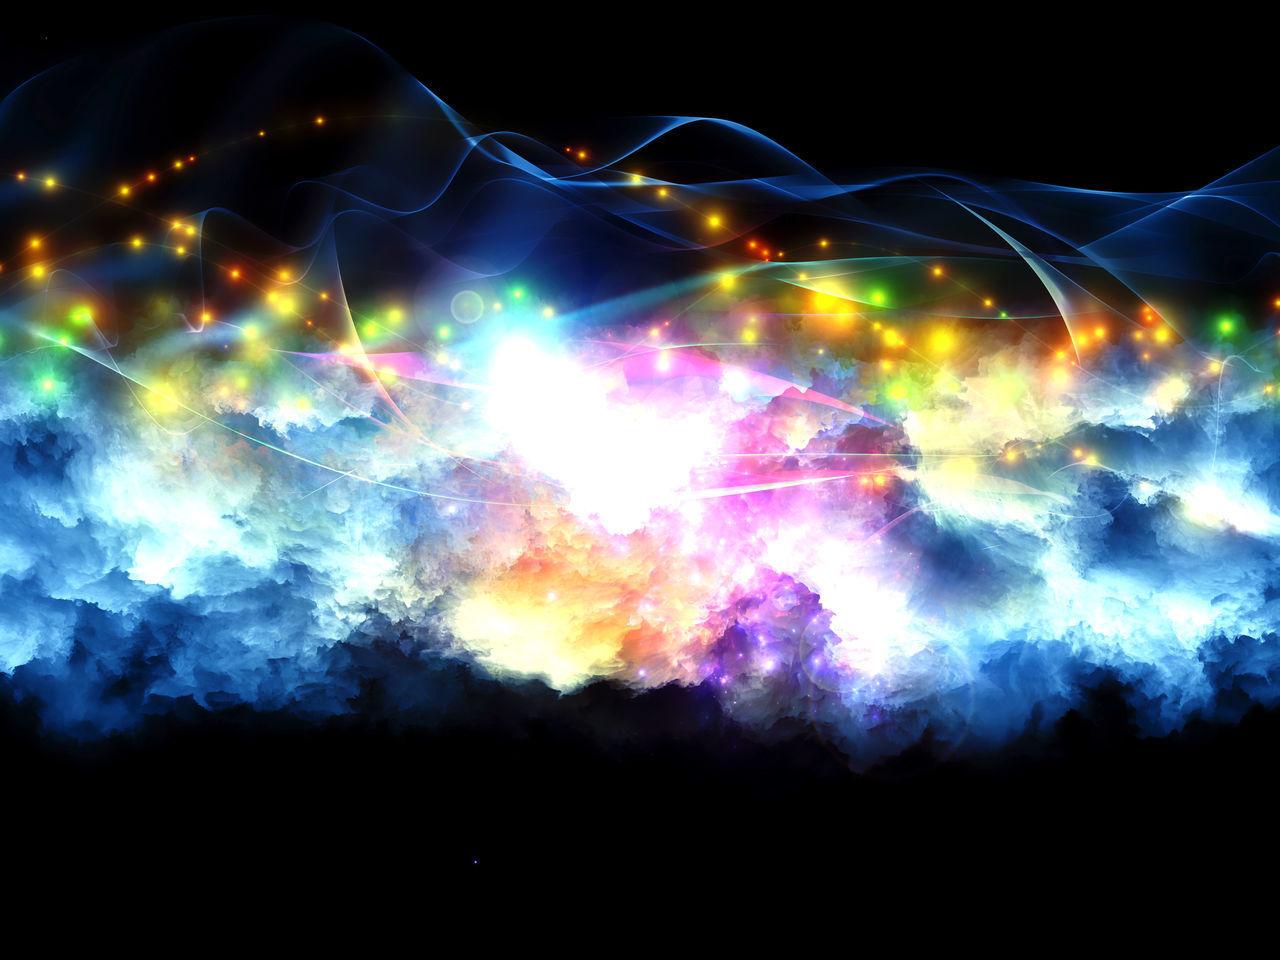 night, light trail, illuminated, multi colored, black background, long exposure, motion, outdoors, studio shot, no people, technology, close-up, nature, lightning, sky, astronomy